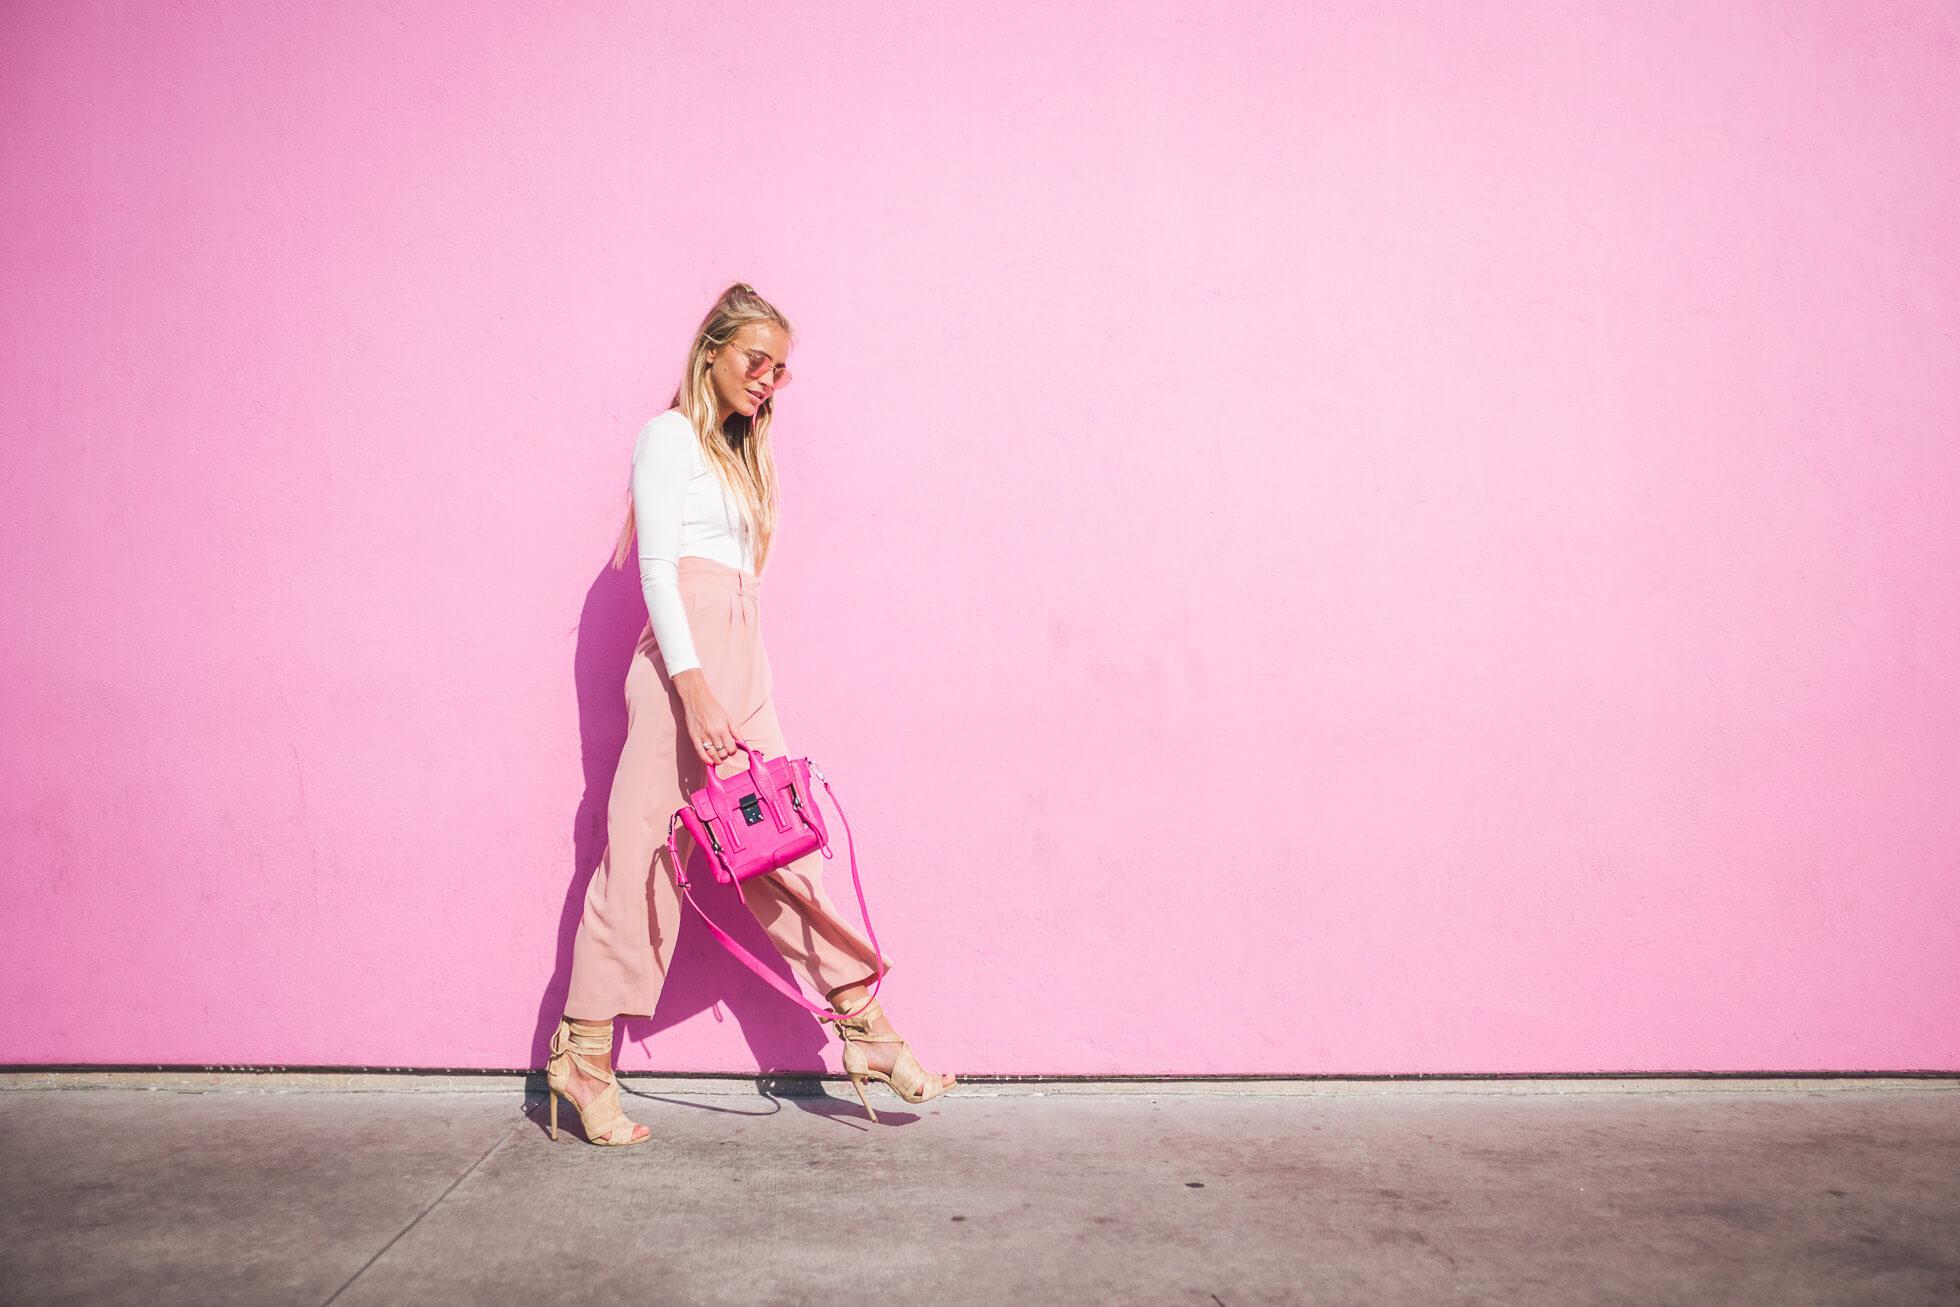 janni-deler-pink-wallL1020855